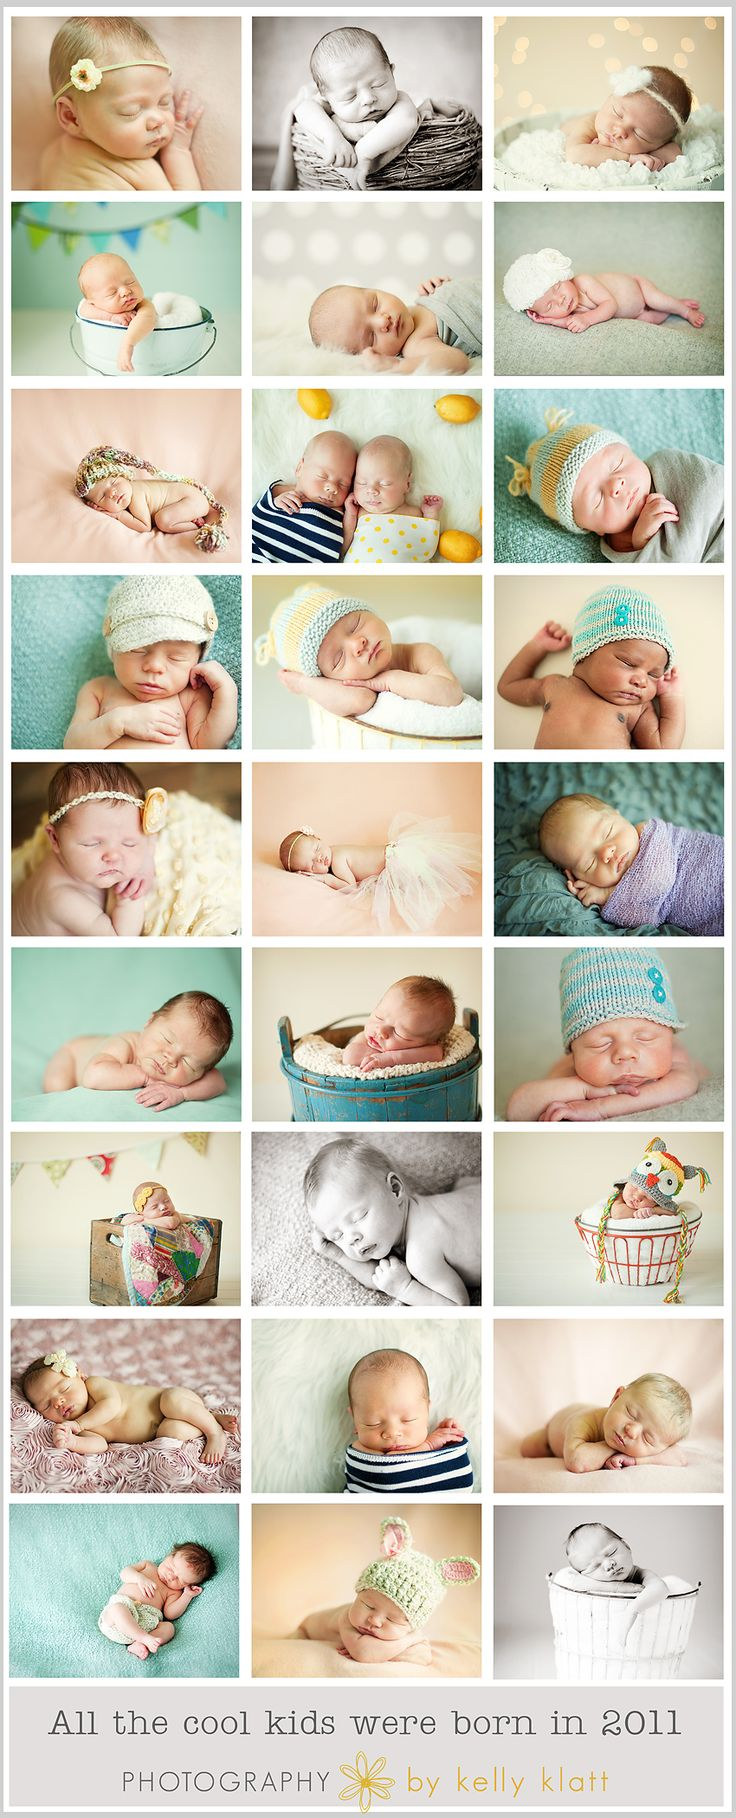 newborn shoot ideas: Photography Newborn, Newborn Photography, Newborn Shoot, Newborn Photos, Inspiration Newborn, Shoot Ideas, Baby Photography, Baby Photos